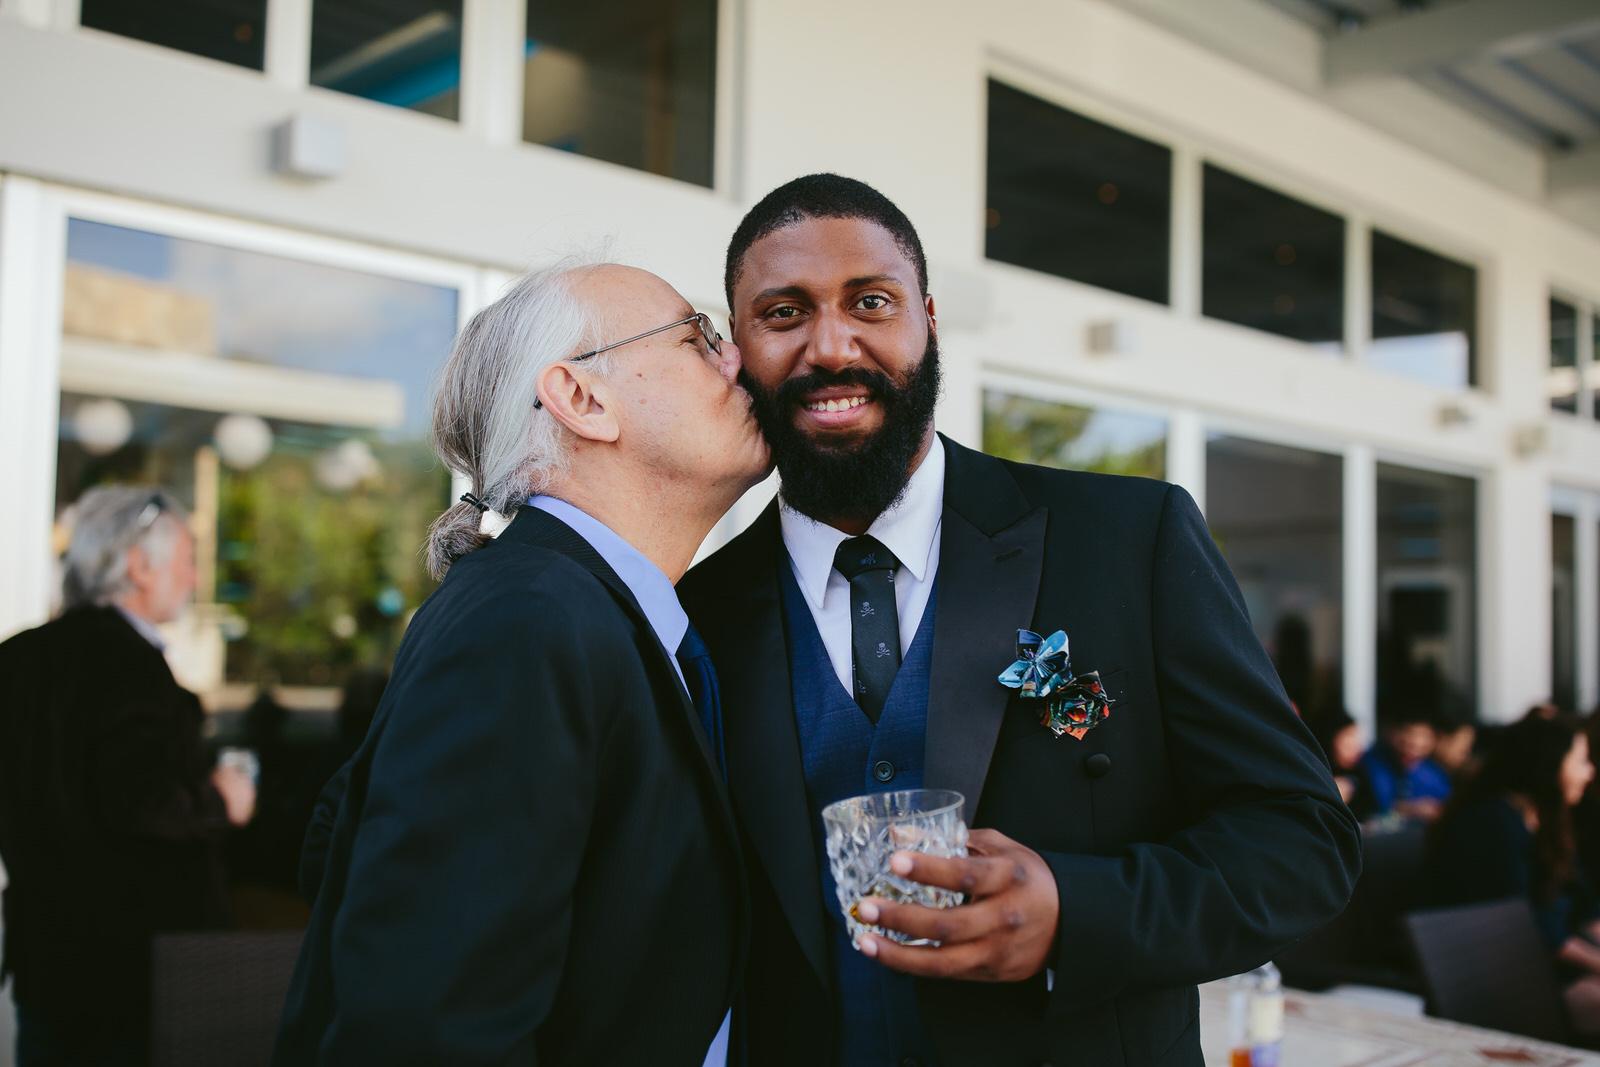 FOB-kissing-groom-candid-moments-wedding-photography.jpg